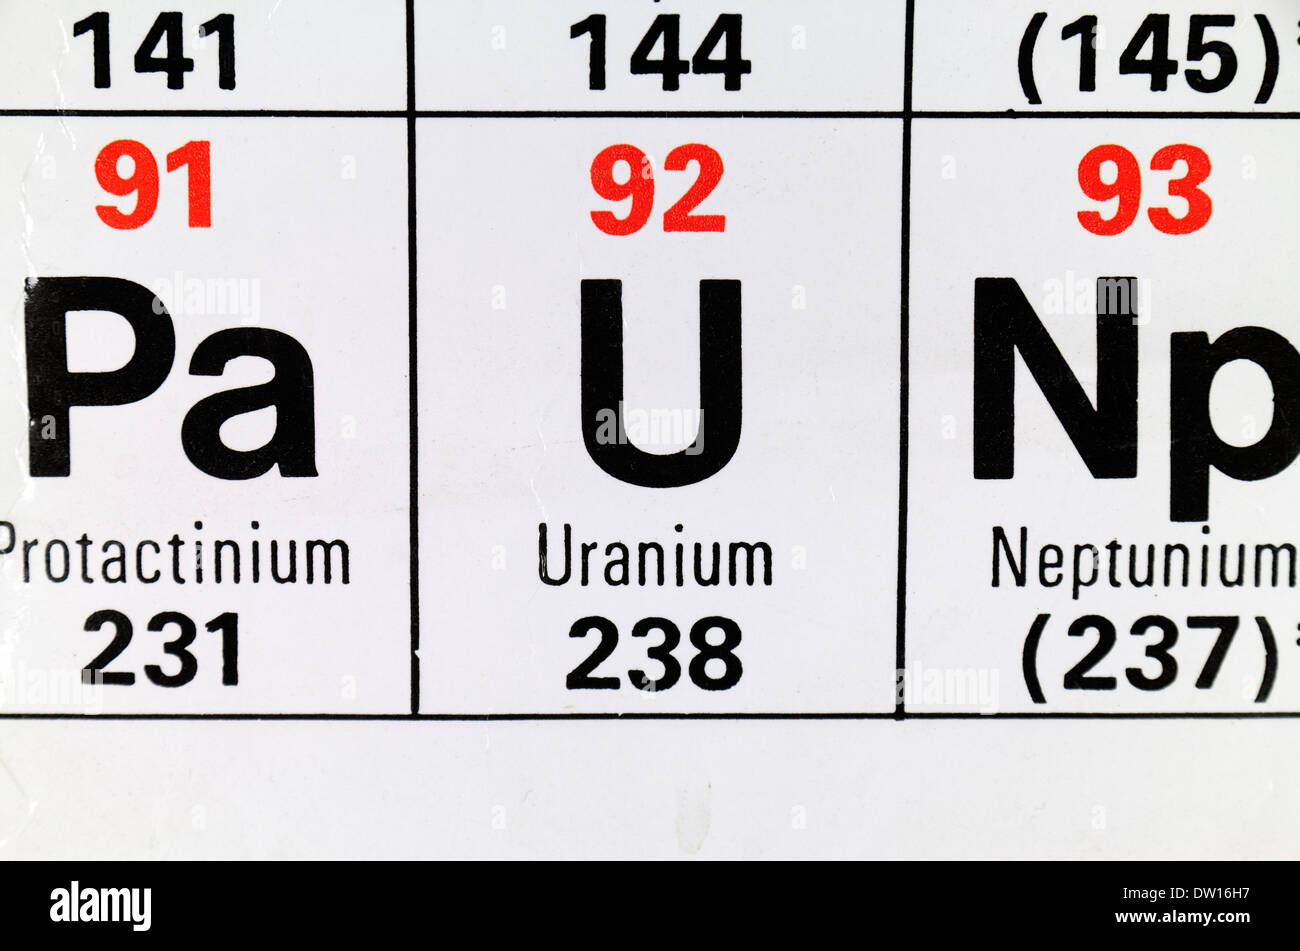 Chemical symbol u stock photos chemical symbol u stock images alamy uranium u as it appears on the periodic table stock image urtaz Image collections